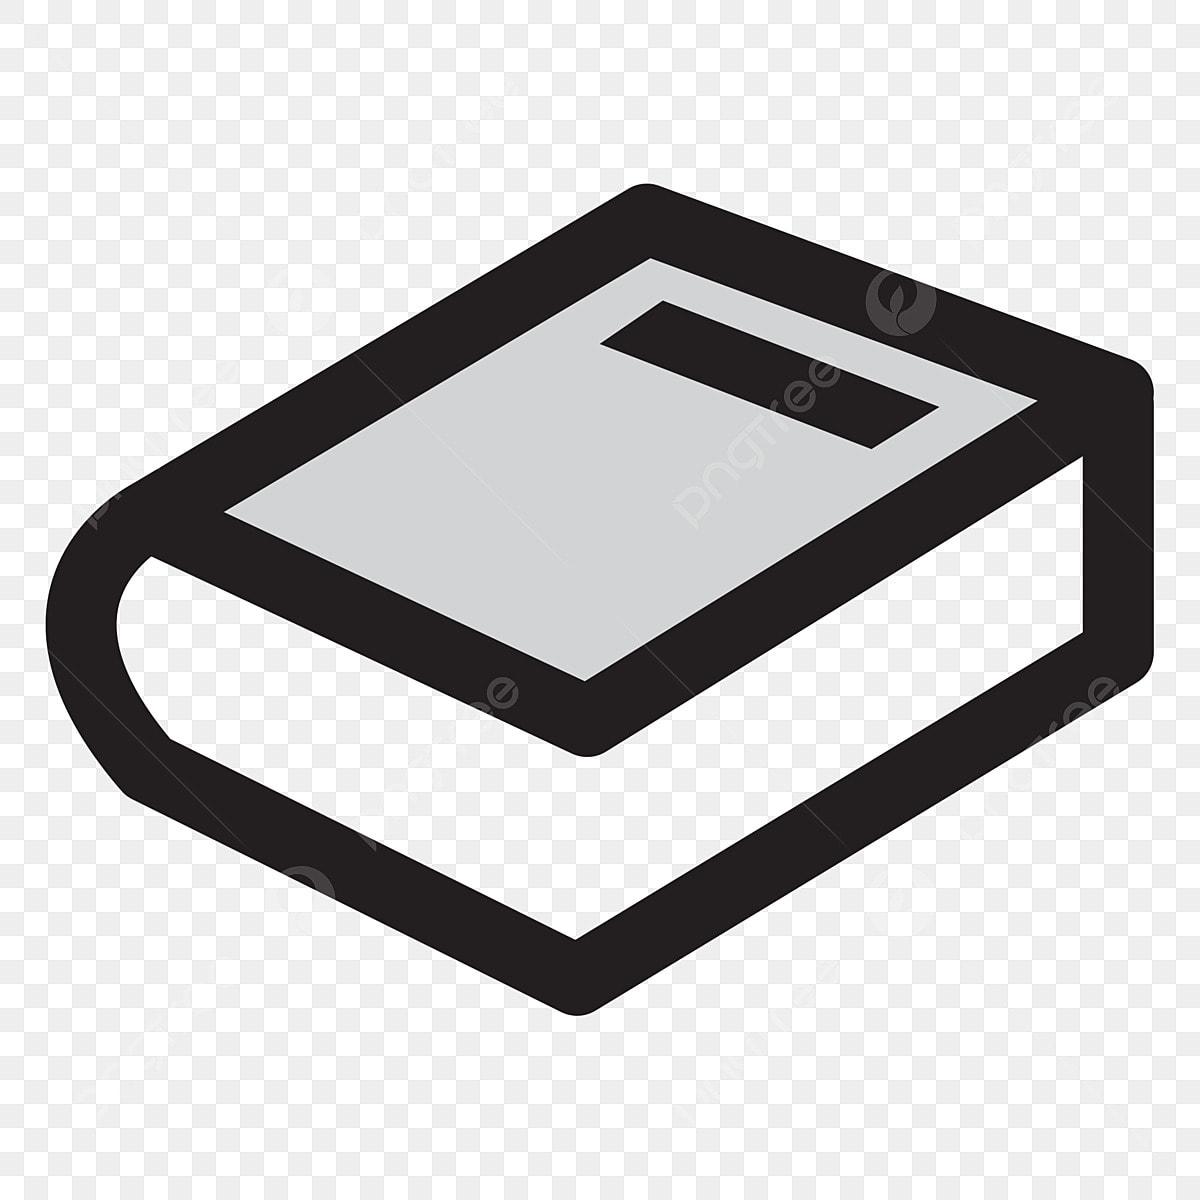 Livre Icone Livre Icone Icone De Livre Fichier Png Et Psd